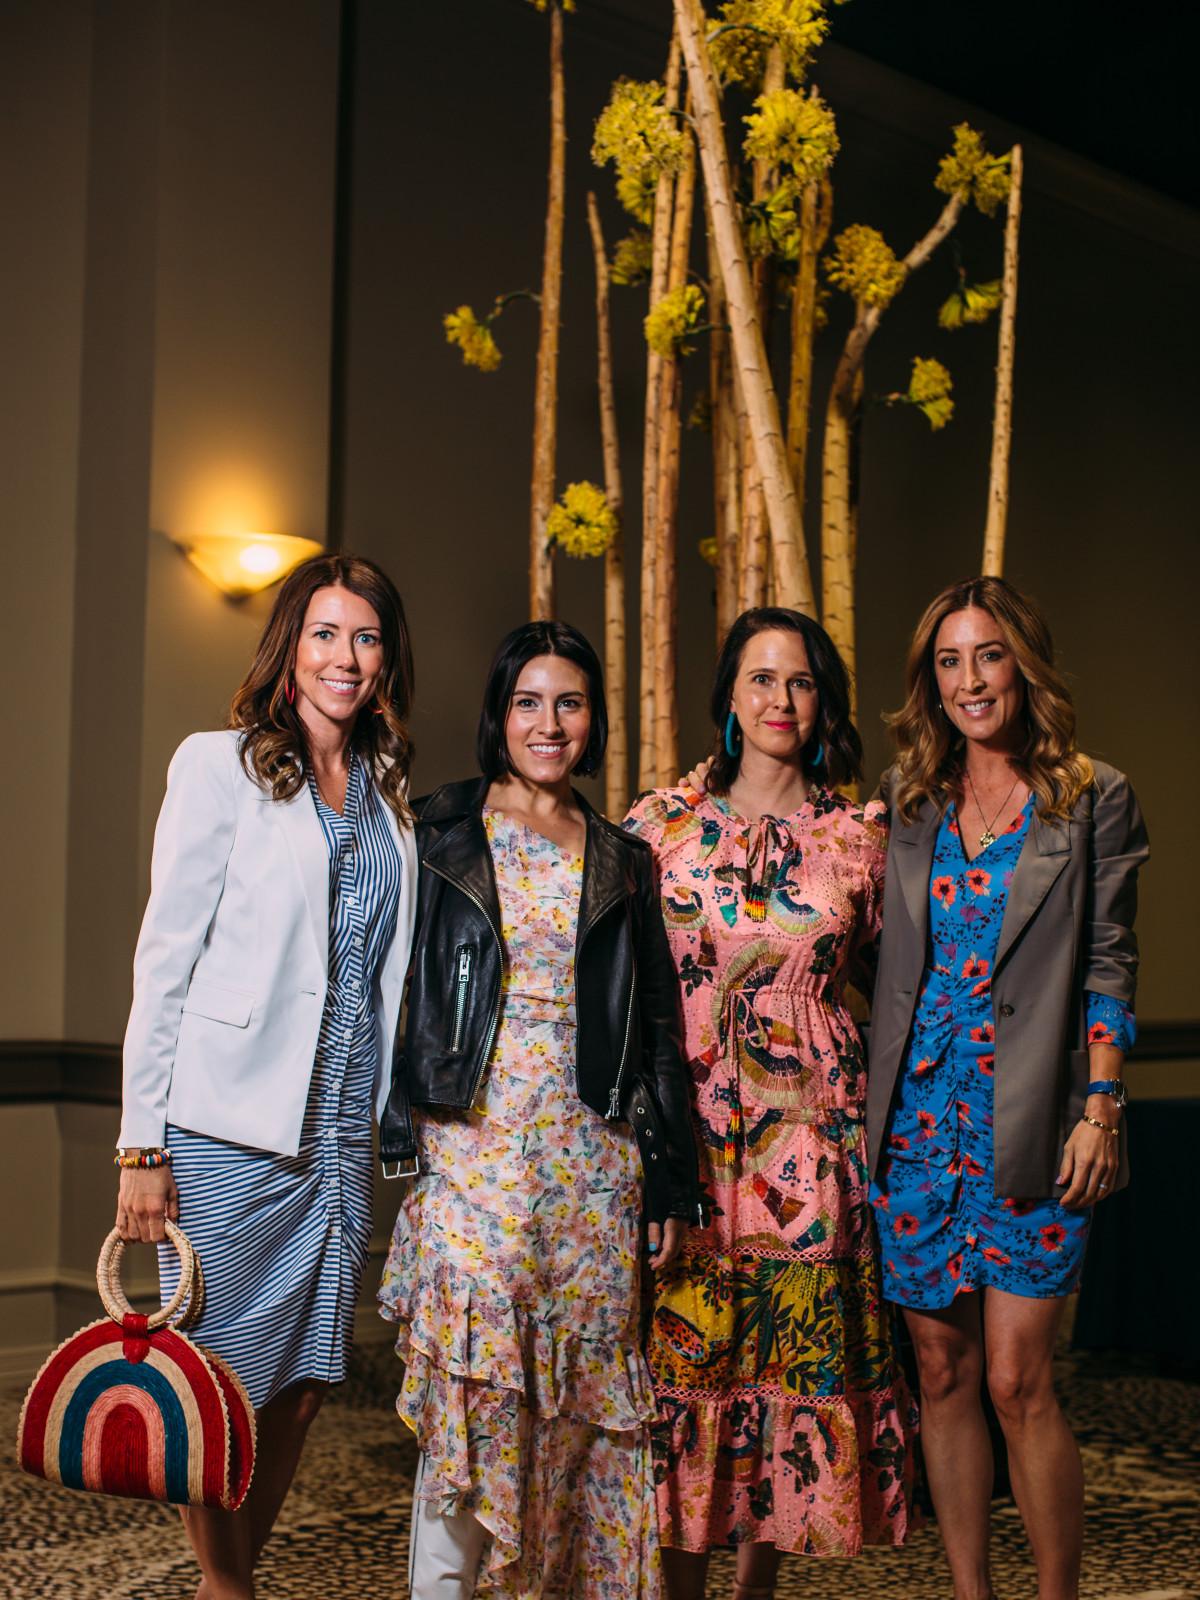 Beth Price, Raquel Wilson, Alethia Vitale, Megan Bennet